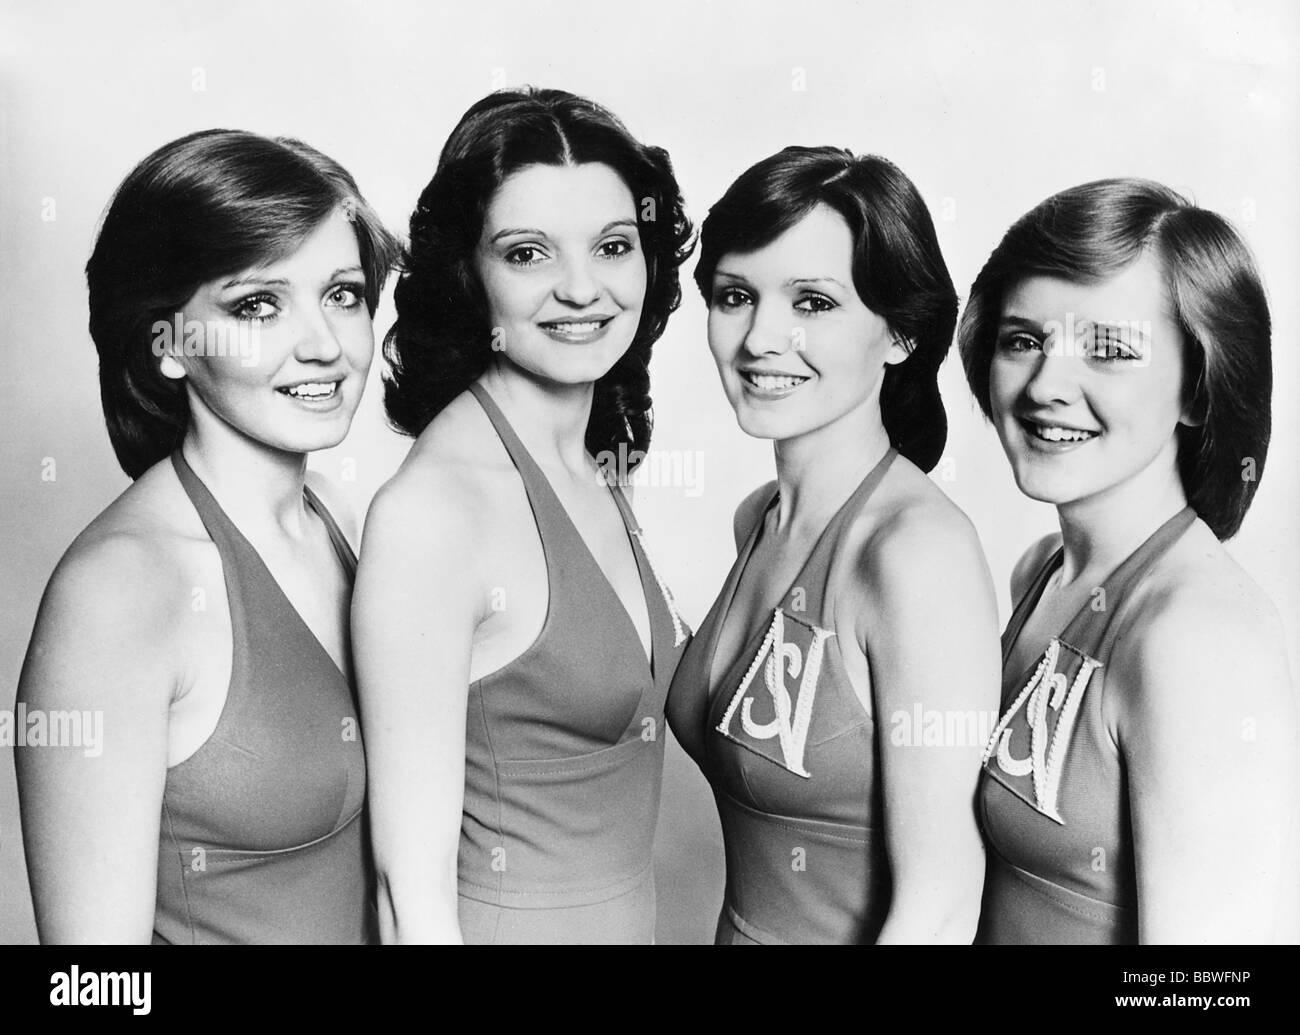 NOLAN SISTERS - UK pop group Stock Photo: 24532754 - Alamy